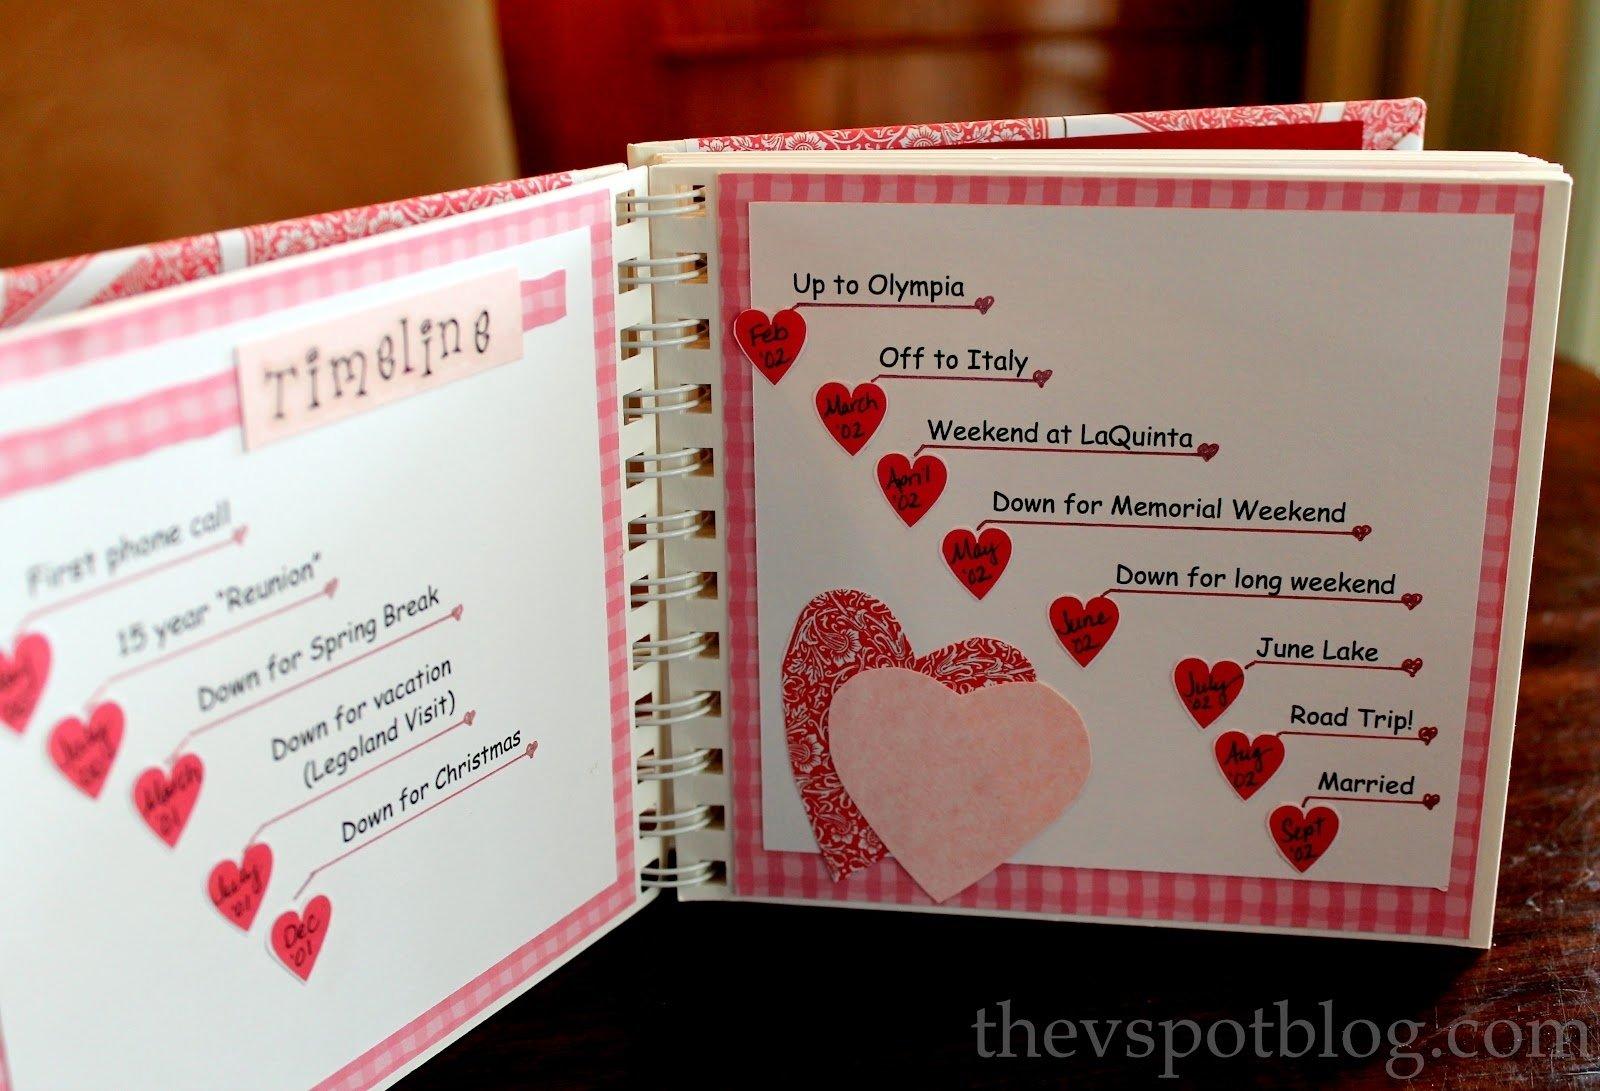 10 Gorgeous Cute Valentines Day Ideas For Him valentine day new creative ideas boyfriend husband him home art 54